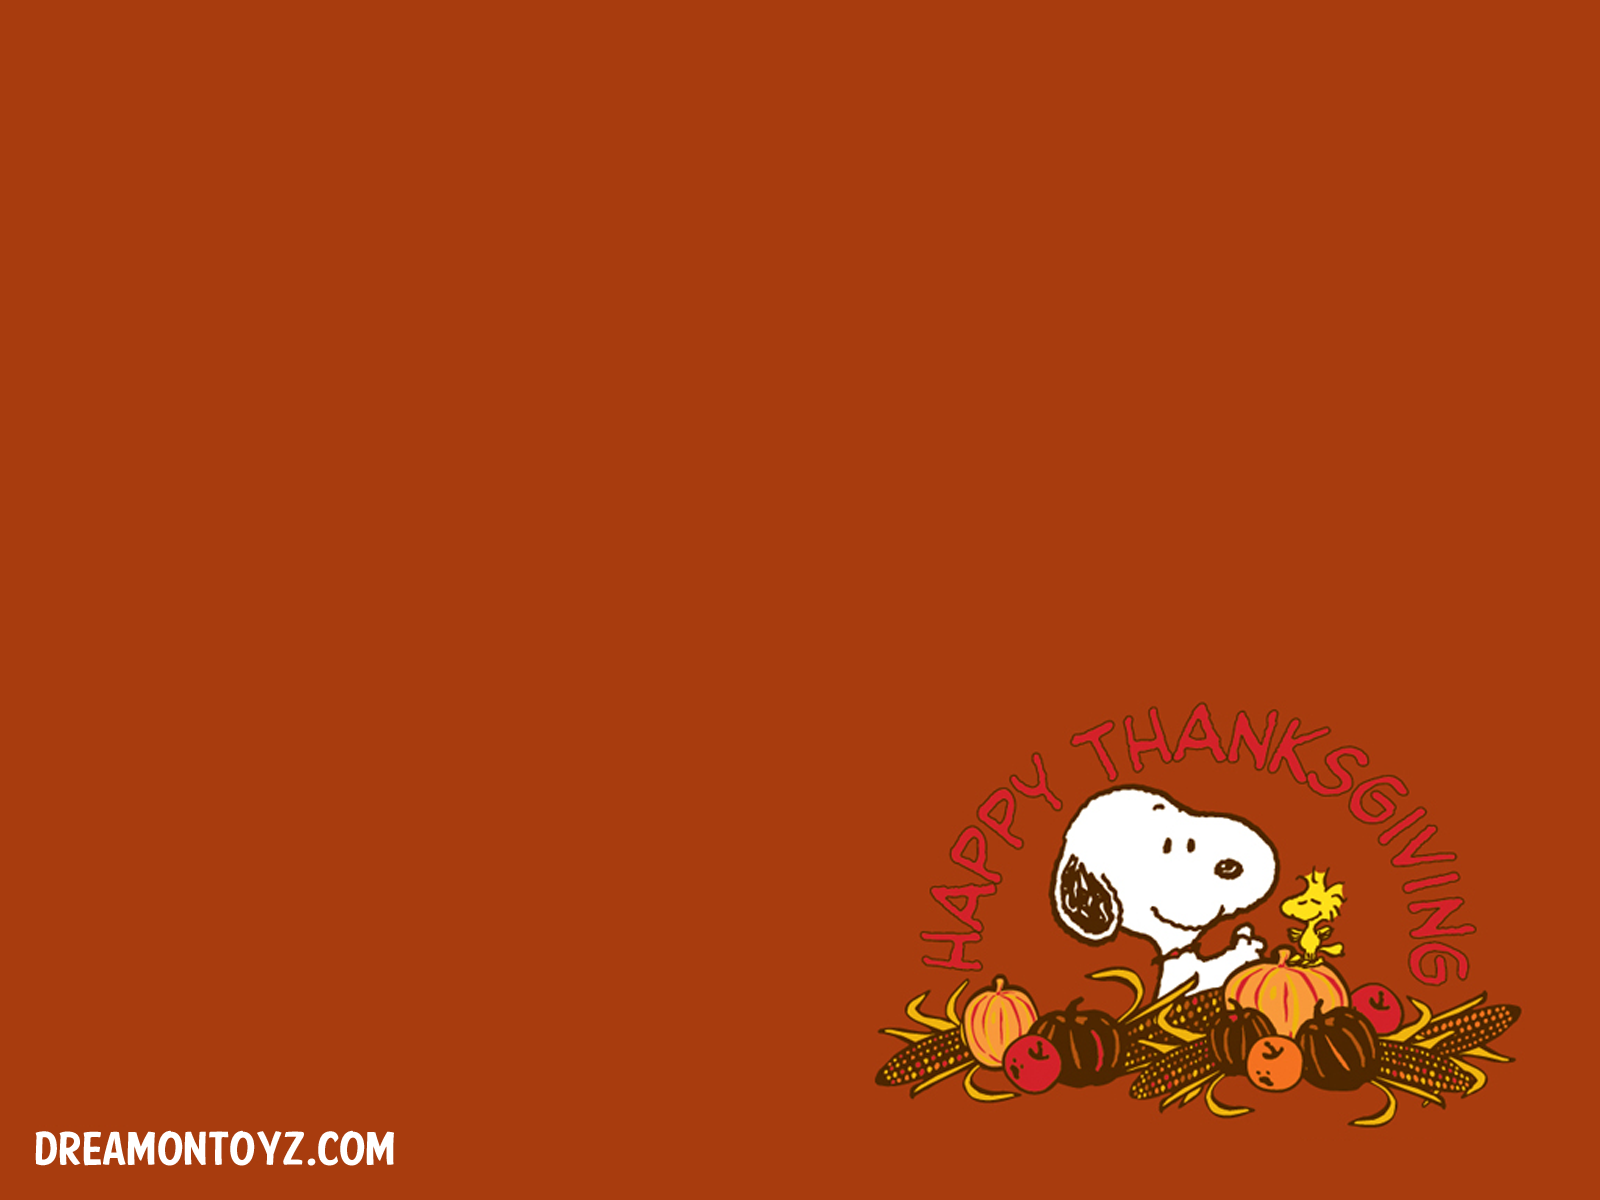 FREE Cartoon Graphics Pics Gifs Photographs Peanuts Snoopy 1600x1200